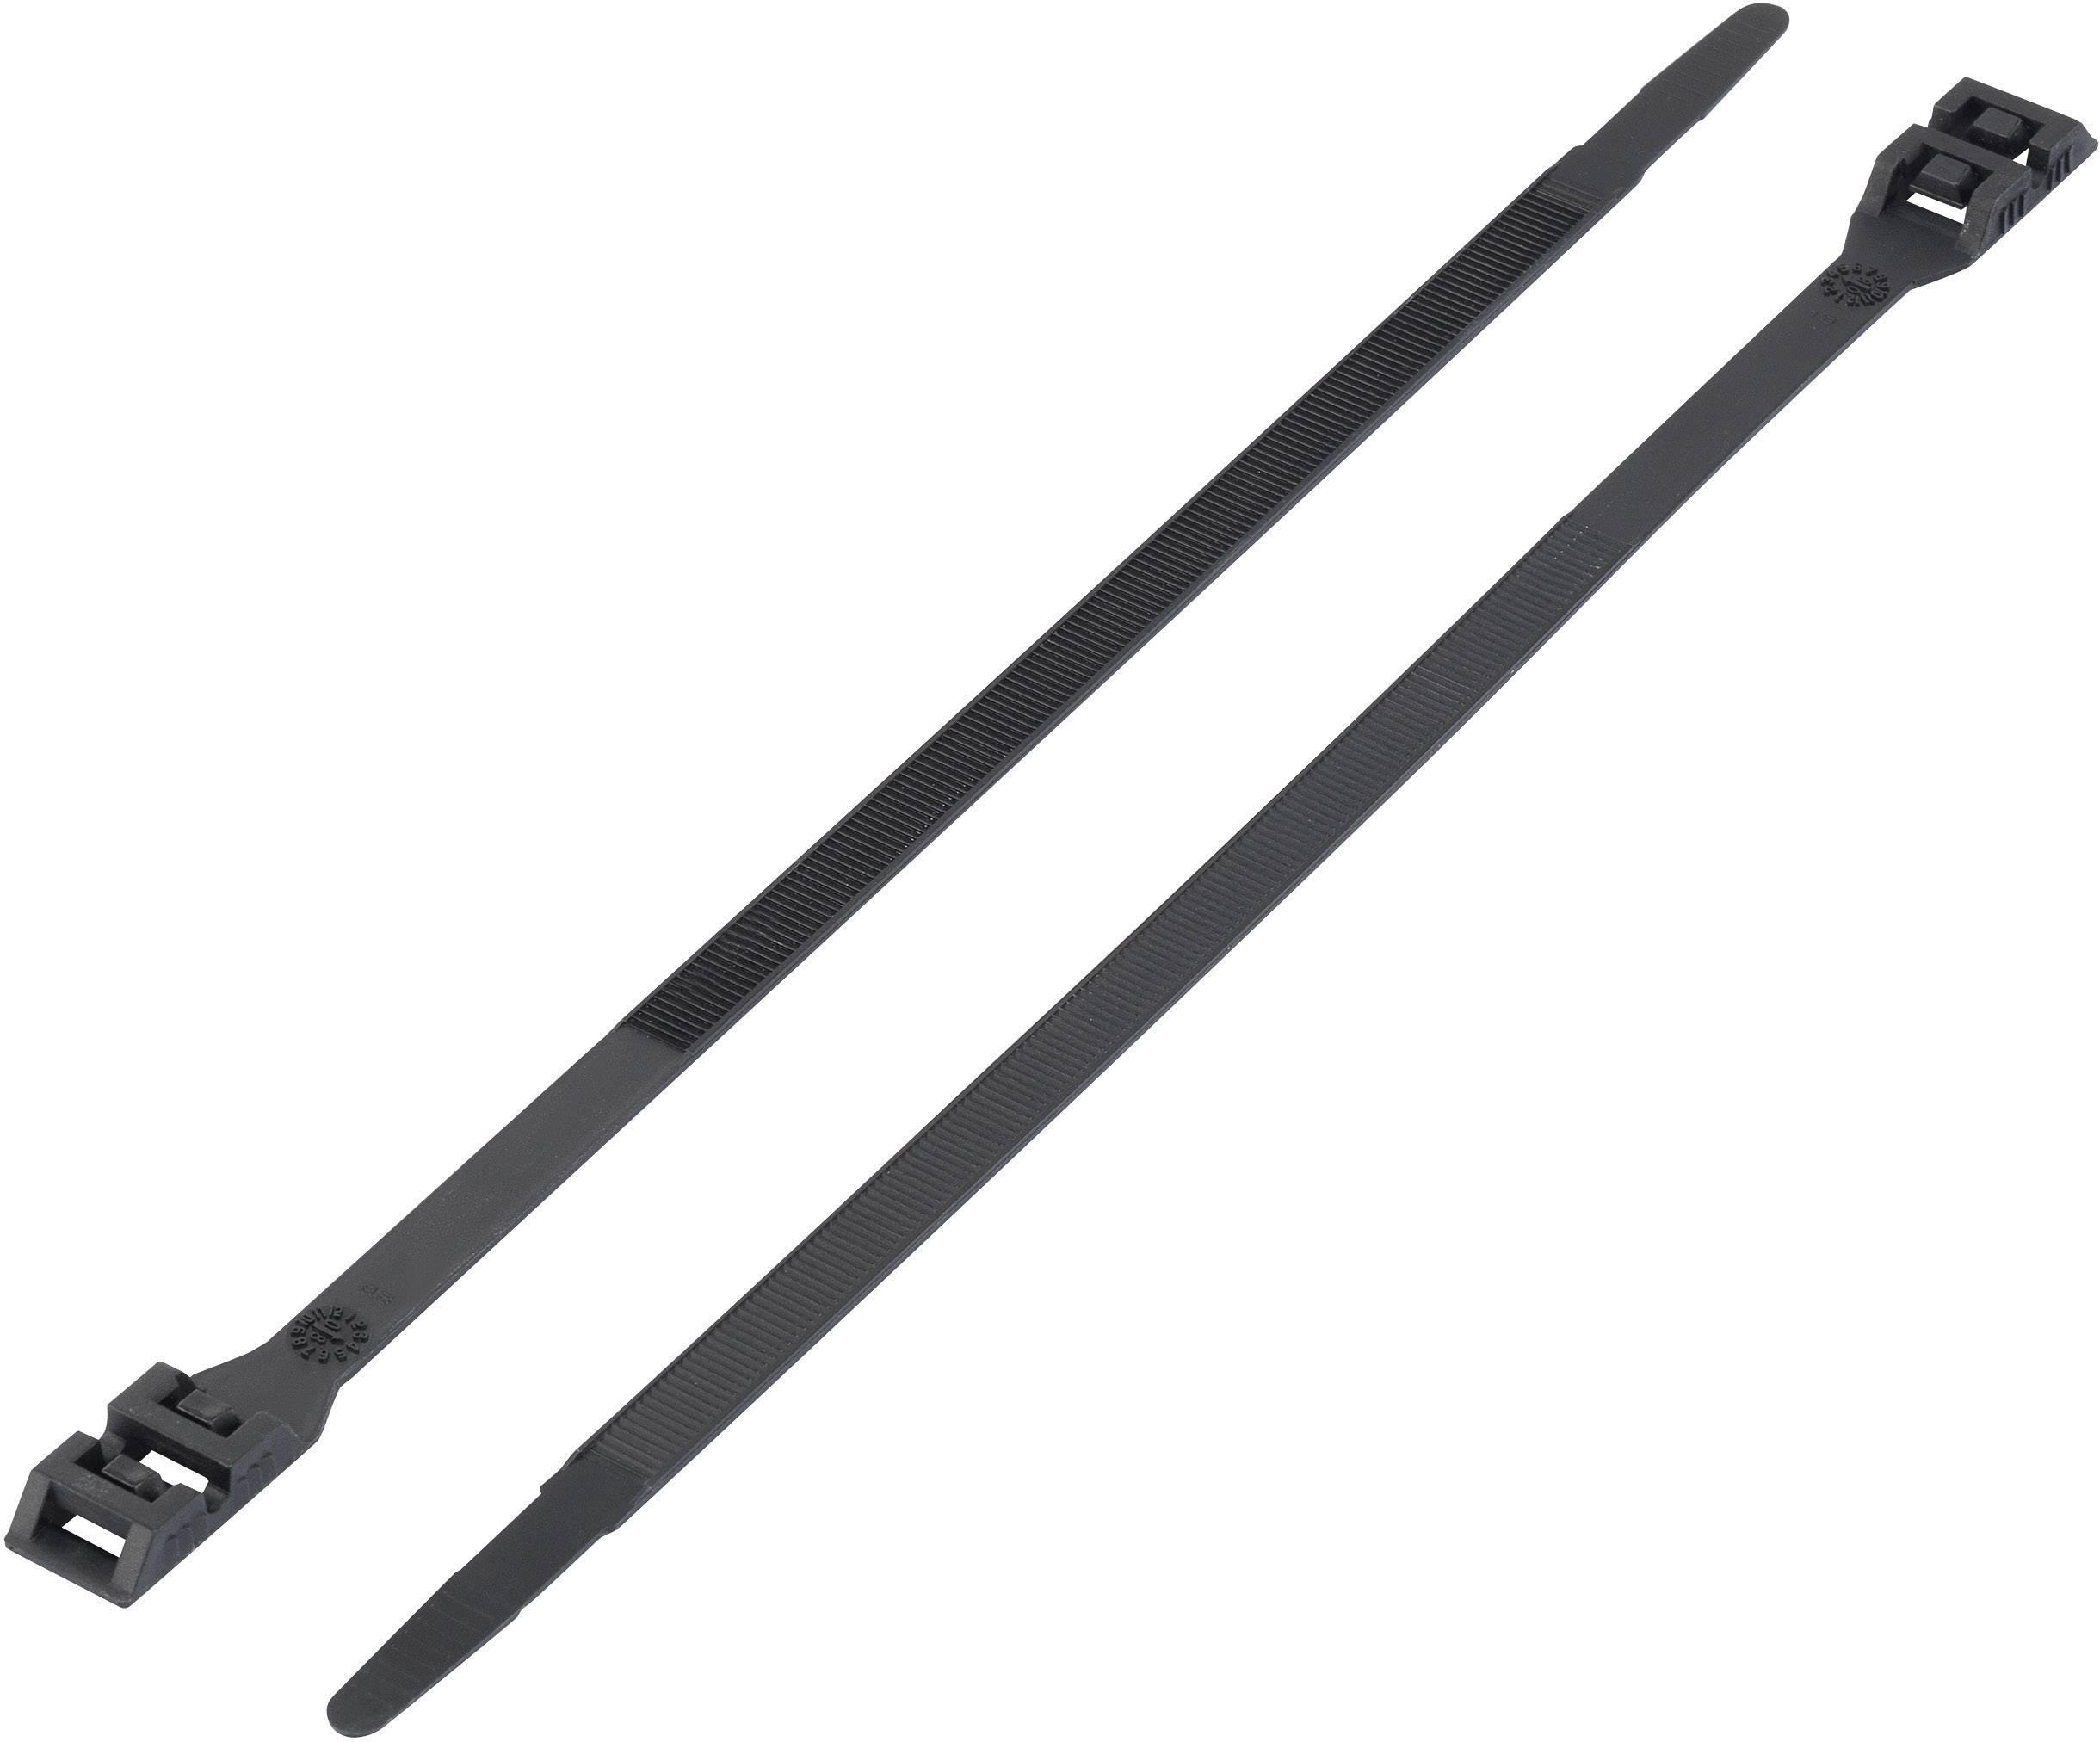 Kabelska vezica z dvojno glavo (D x Š) 265 mm x 9 mm DK-265BK črna, 1 kos, KSS